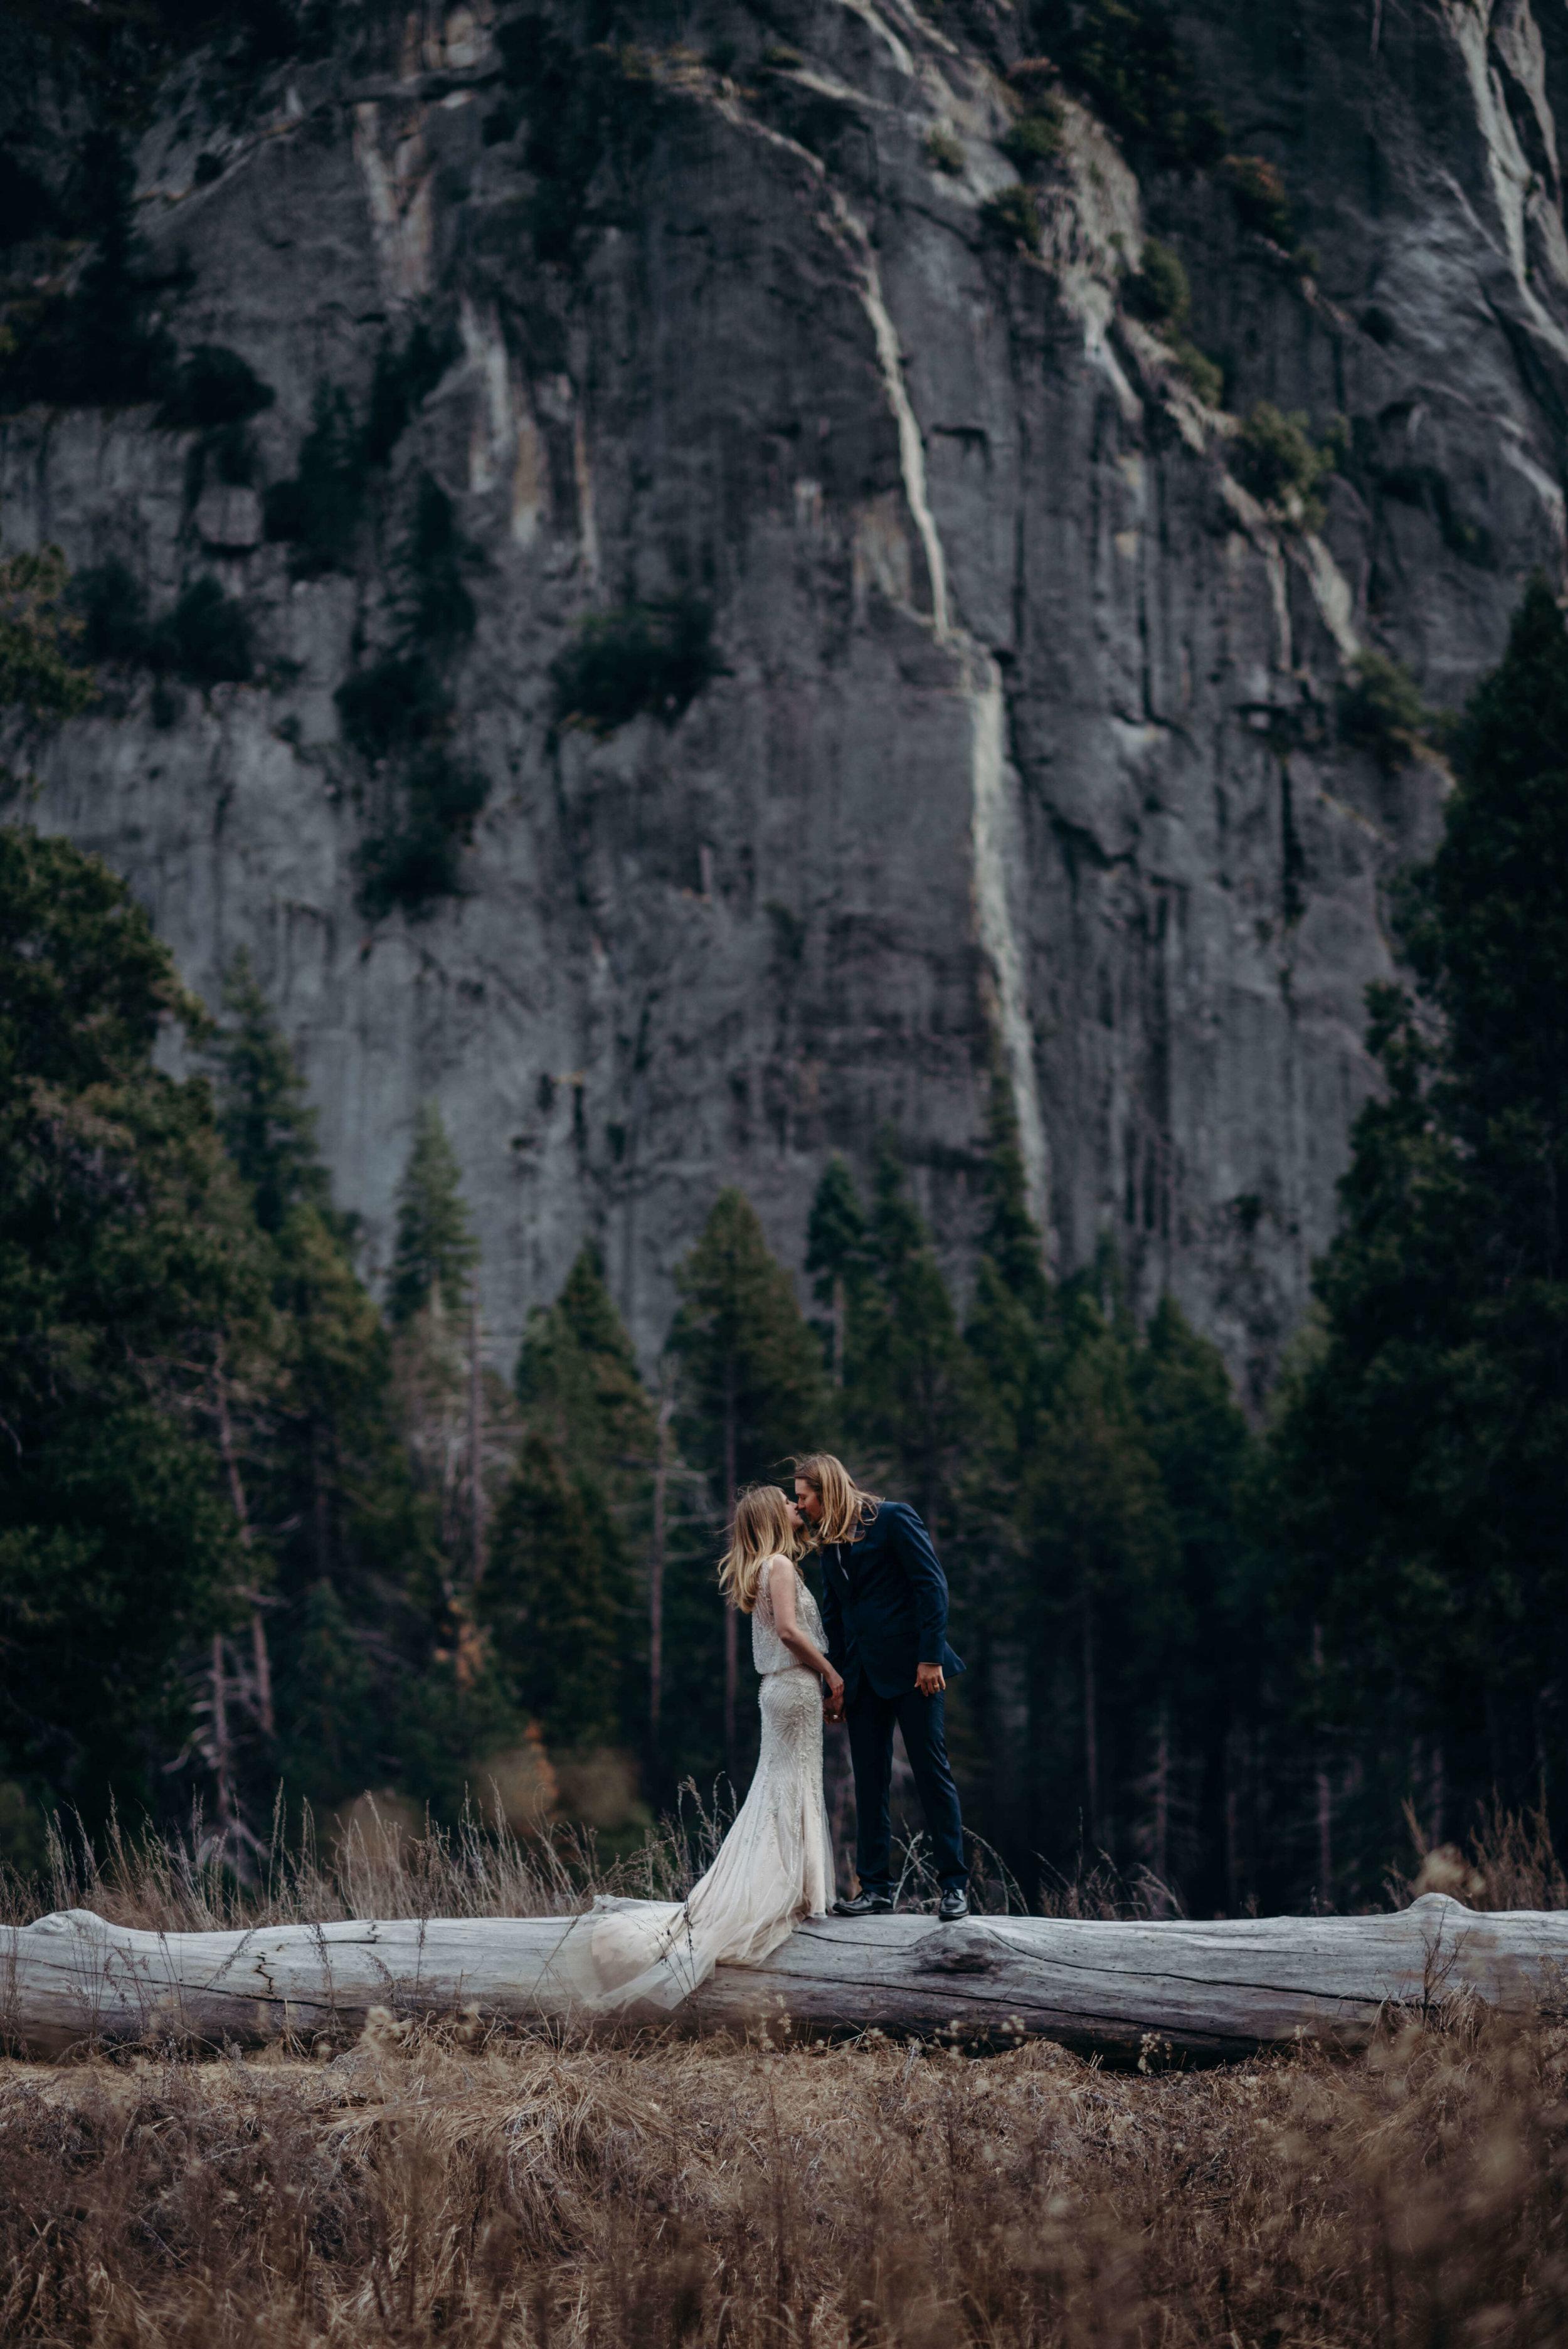 Adventure-Elopement-Yosemite-Valley-14.jpg